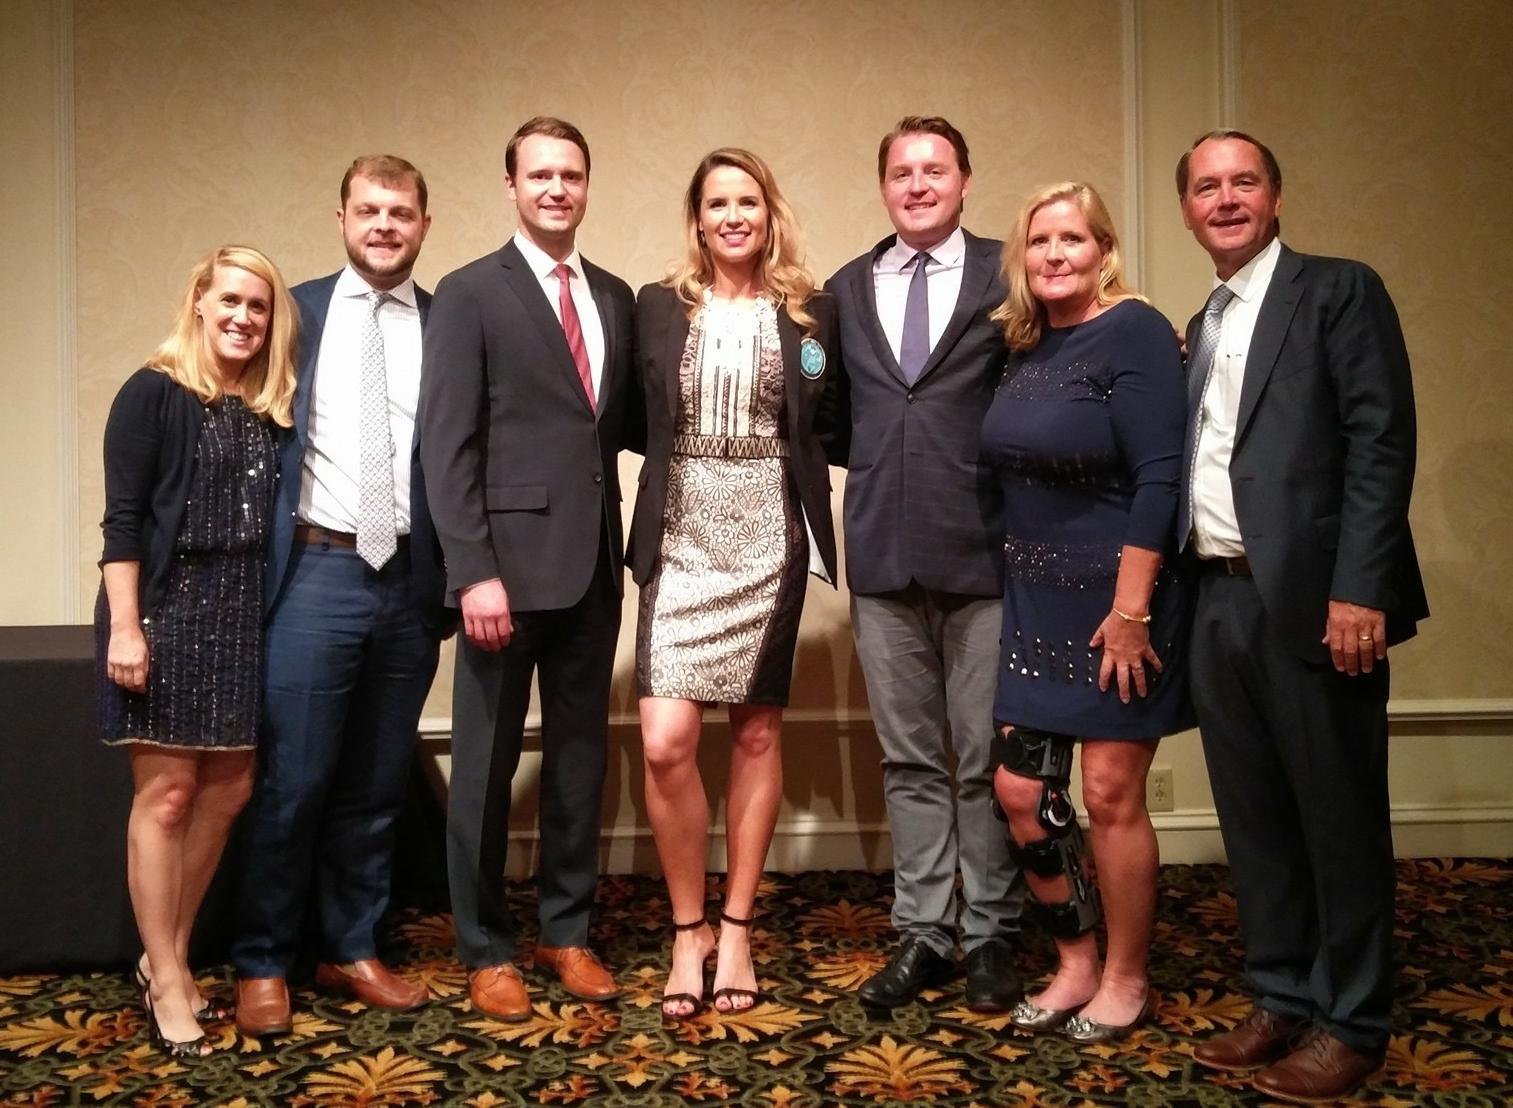 The Joyce Family at the Georgia Aquatics Hall of Fame dinner.